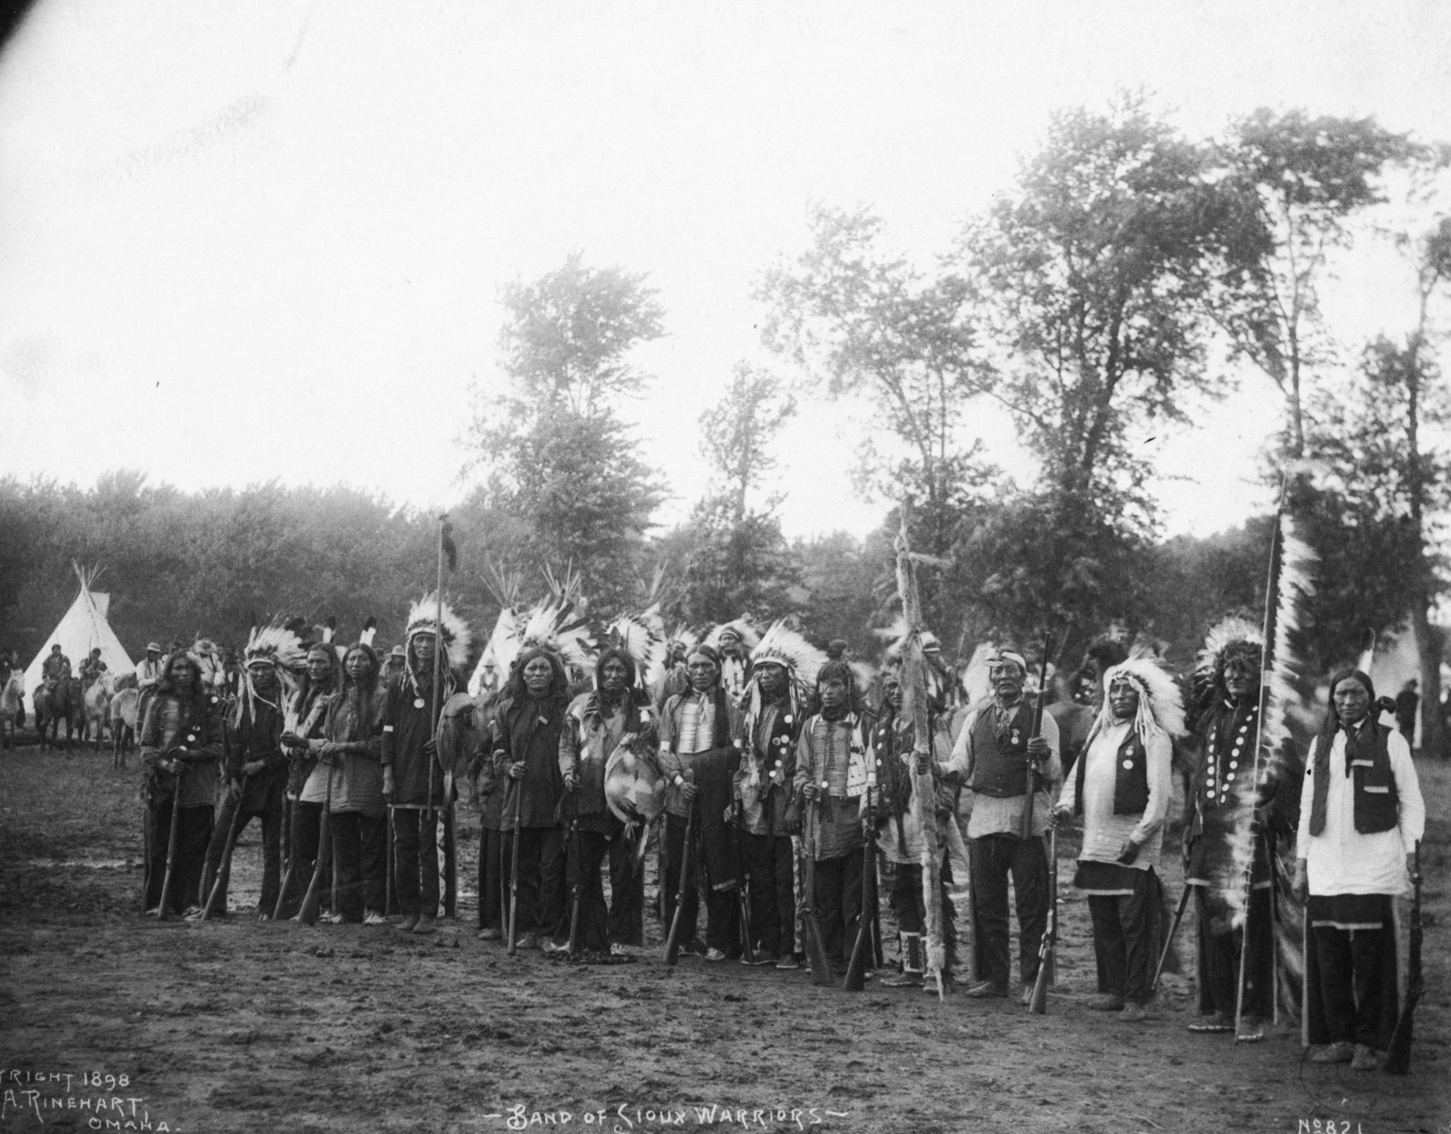 Grupo de guerreros Sioux - Fotografía: Rinehart, F. A. (Frank A.). Dakota Indians; Trans-Mississippi and International Exposition (1898 Omaha, Neb.)